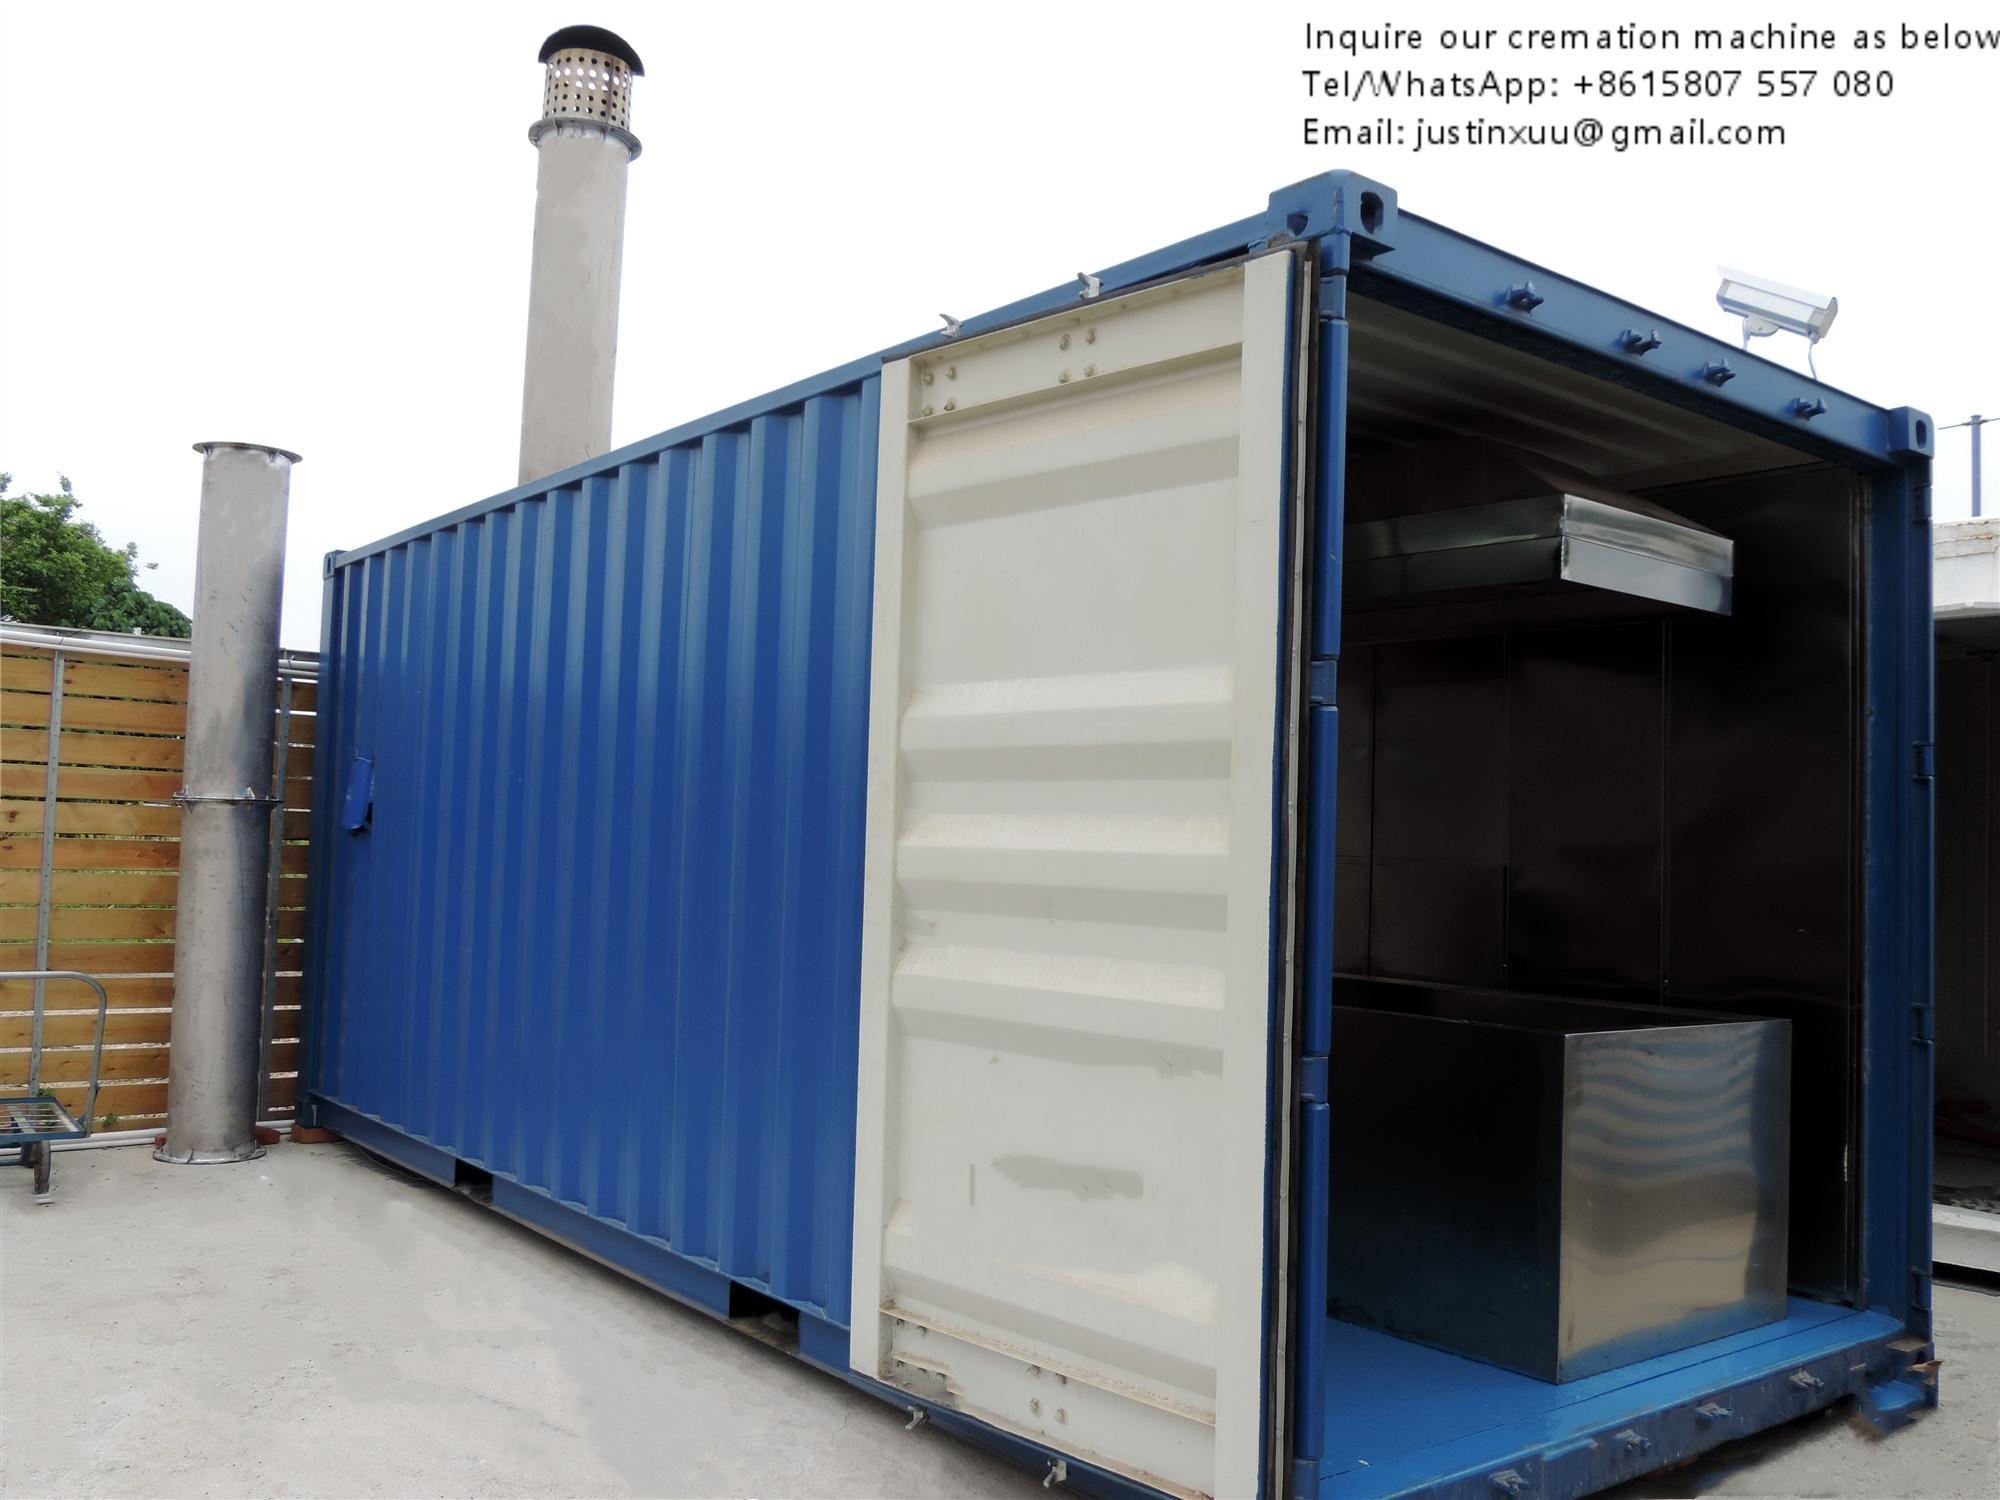 human crematorium furnace negative pressure burning corpses no smoke EU standard